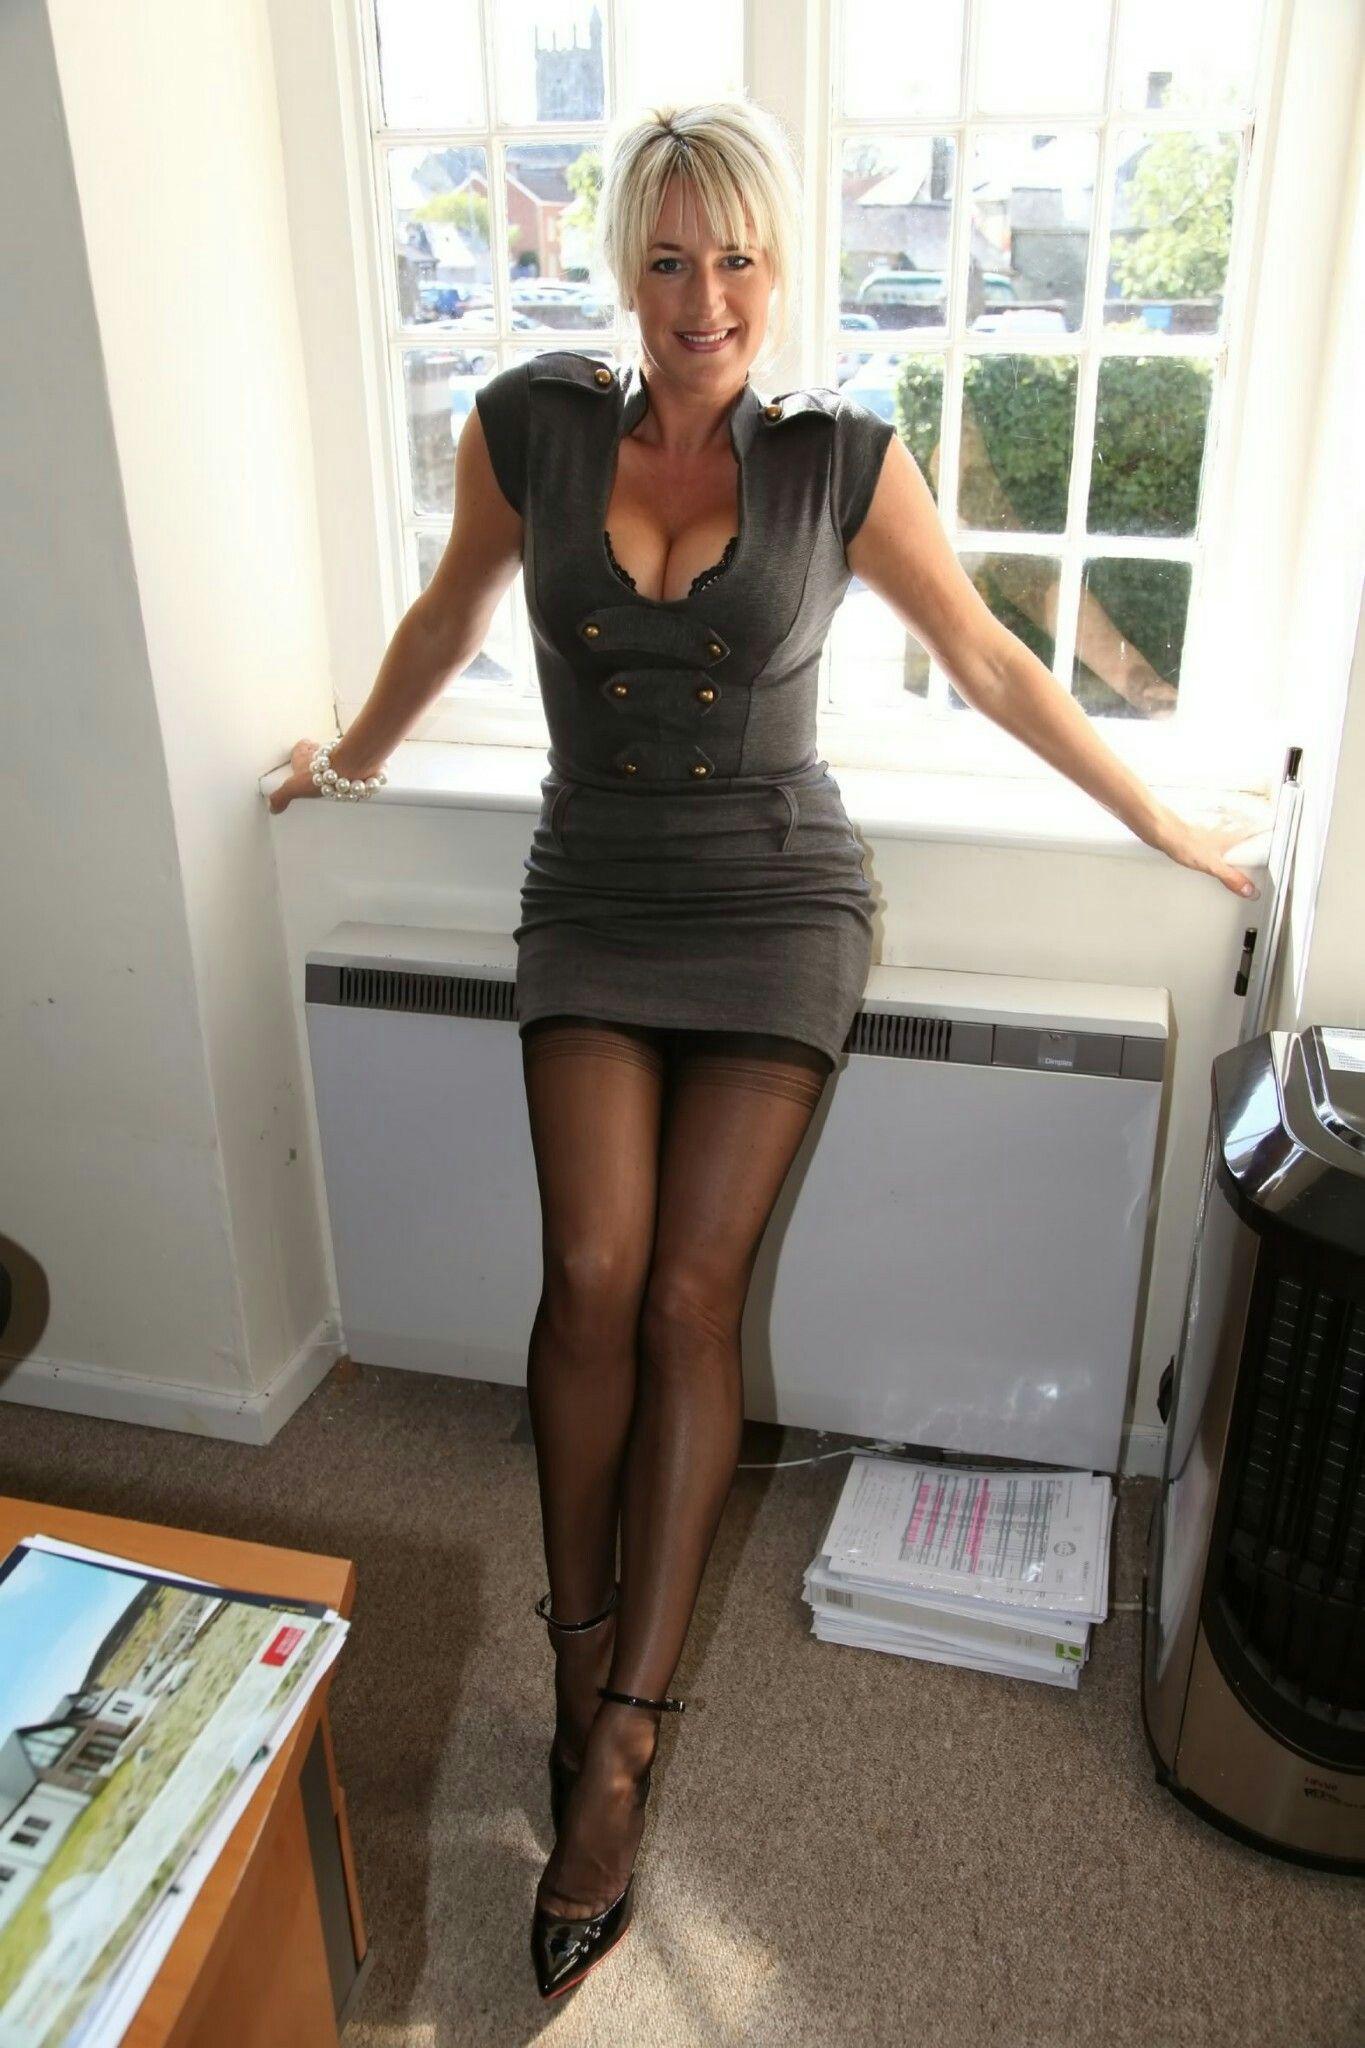 Sexy mature women in little black dress something